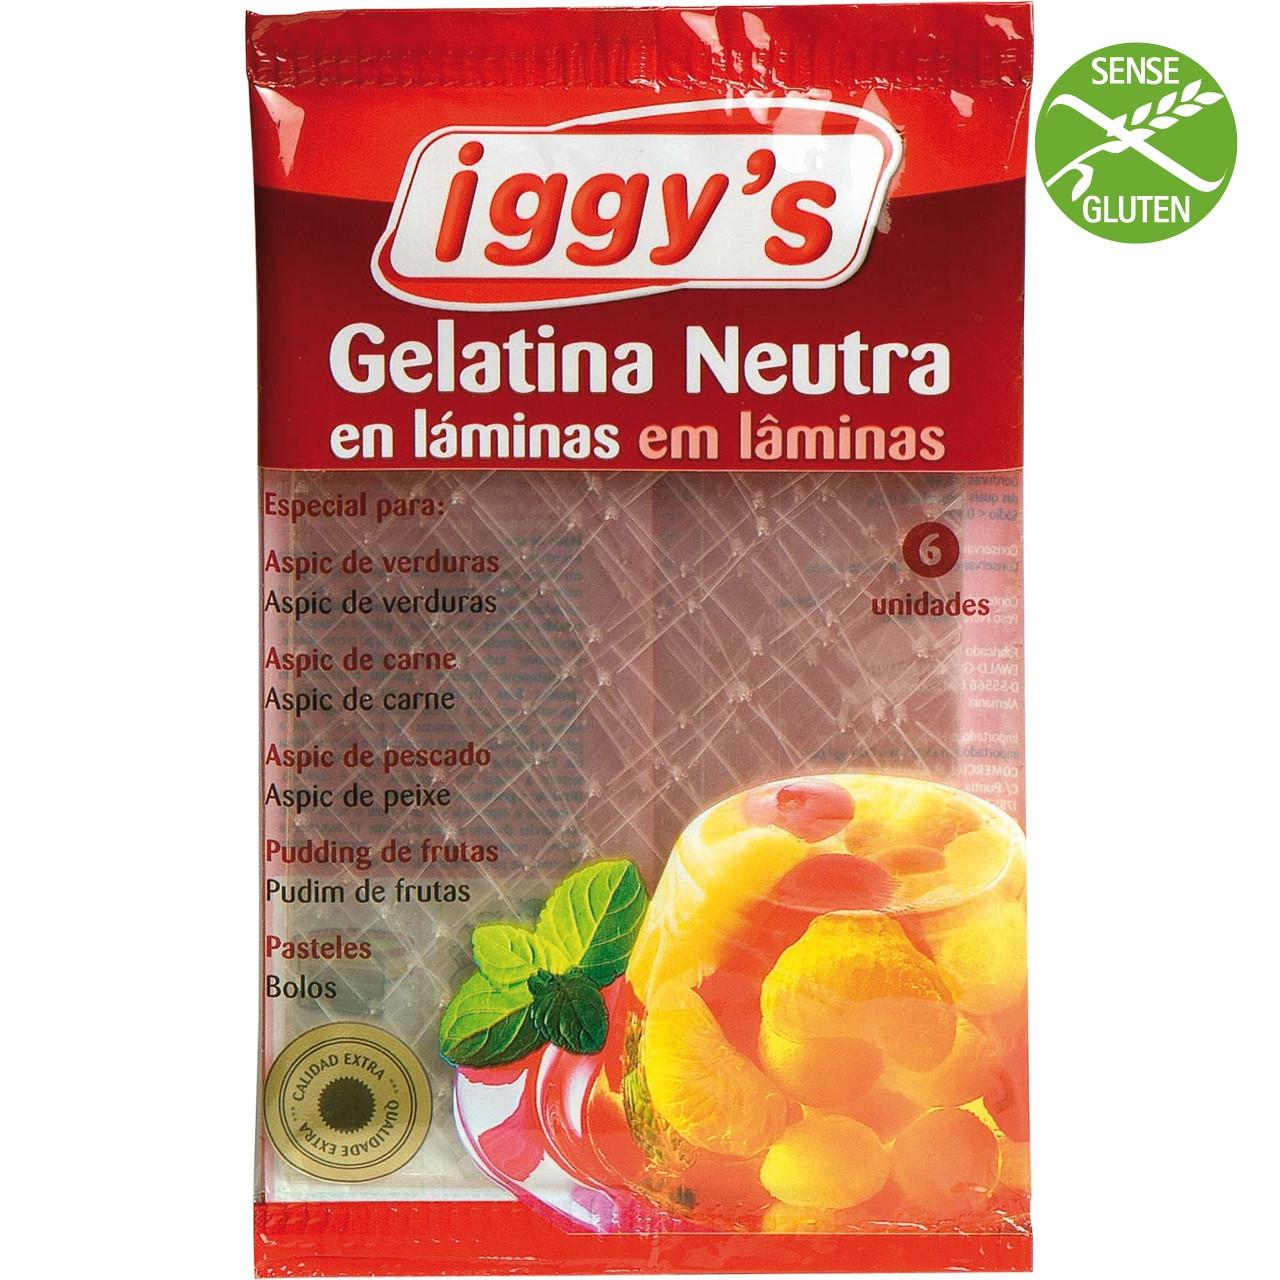 Iggy's gelatina neutra 6 llamines 10g.